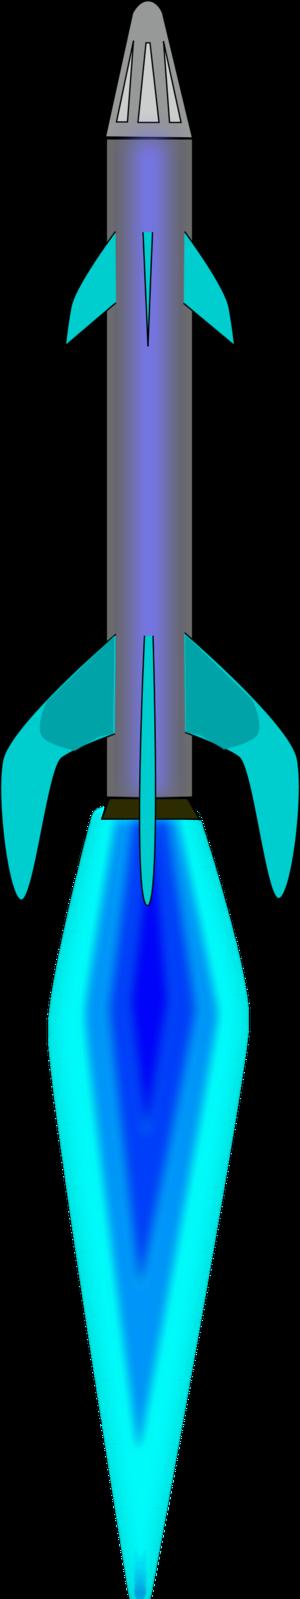 Spacecraft booster clip art. Clipart rocket diwali